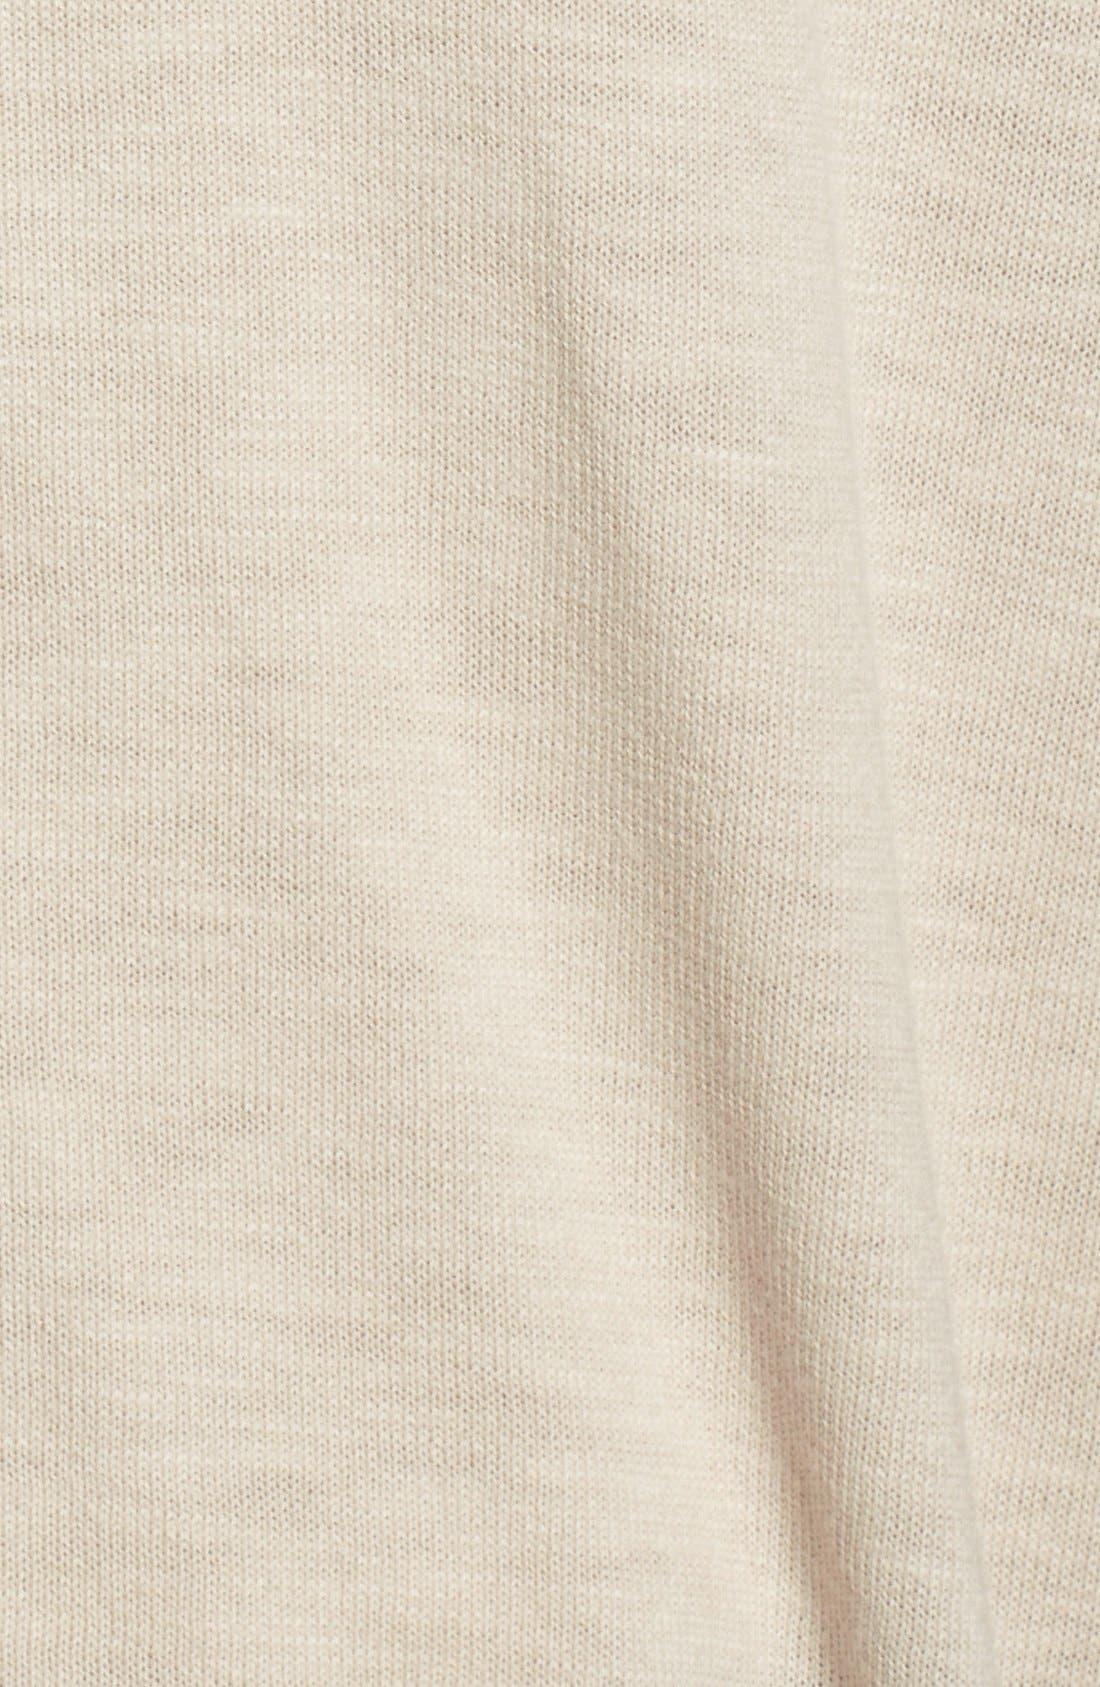 Alternate Image 3  - Tommy Bahama Denim 'Sandstone Beach' Cotton V-Neck Sweatshirt